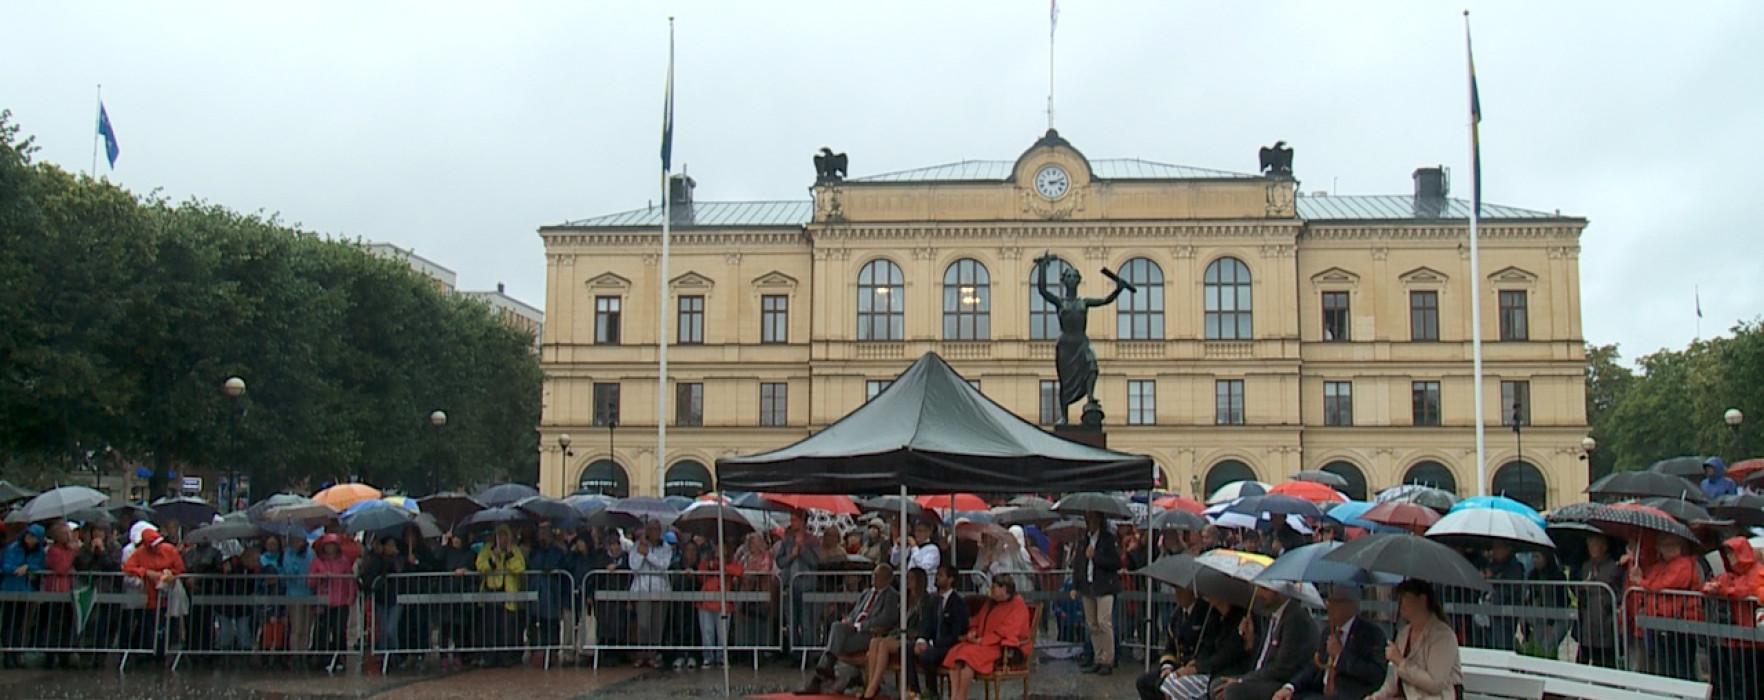 Glimt – Prinsparets besök i Karlstad